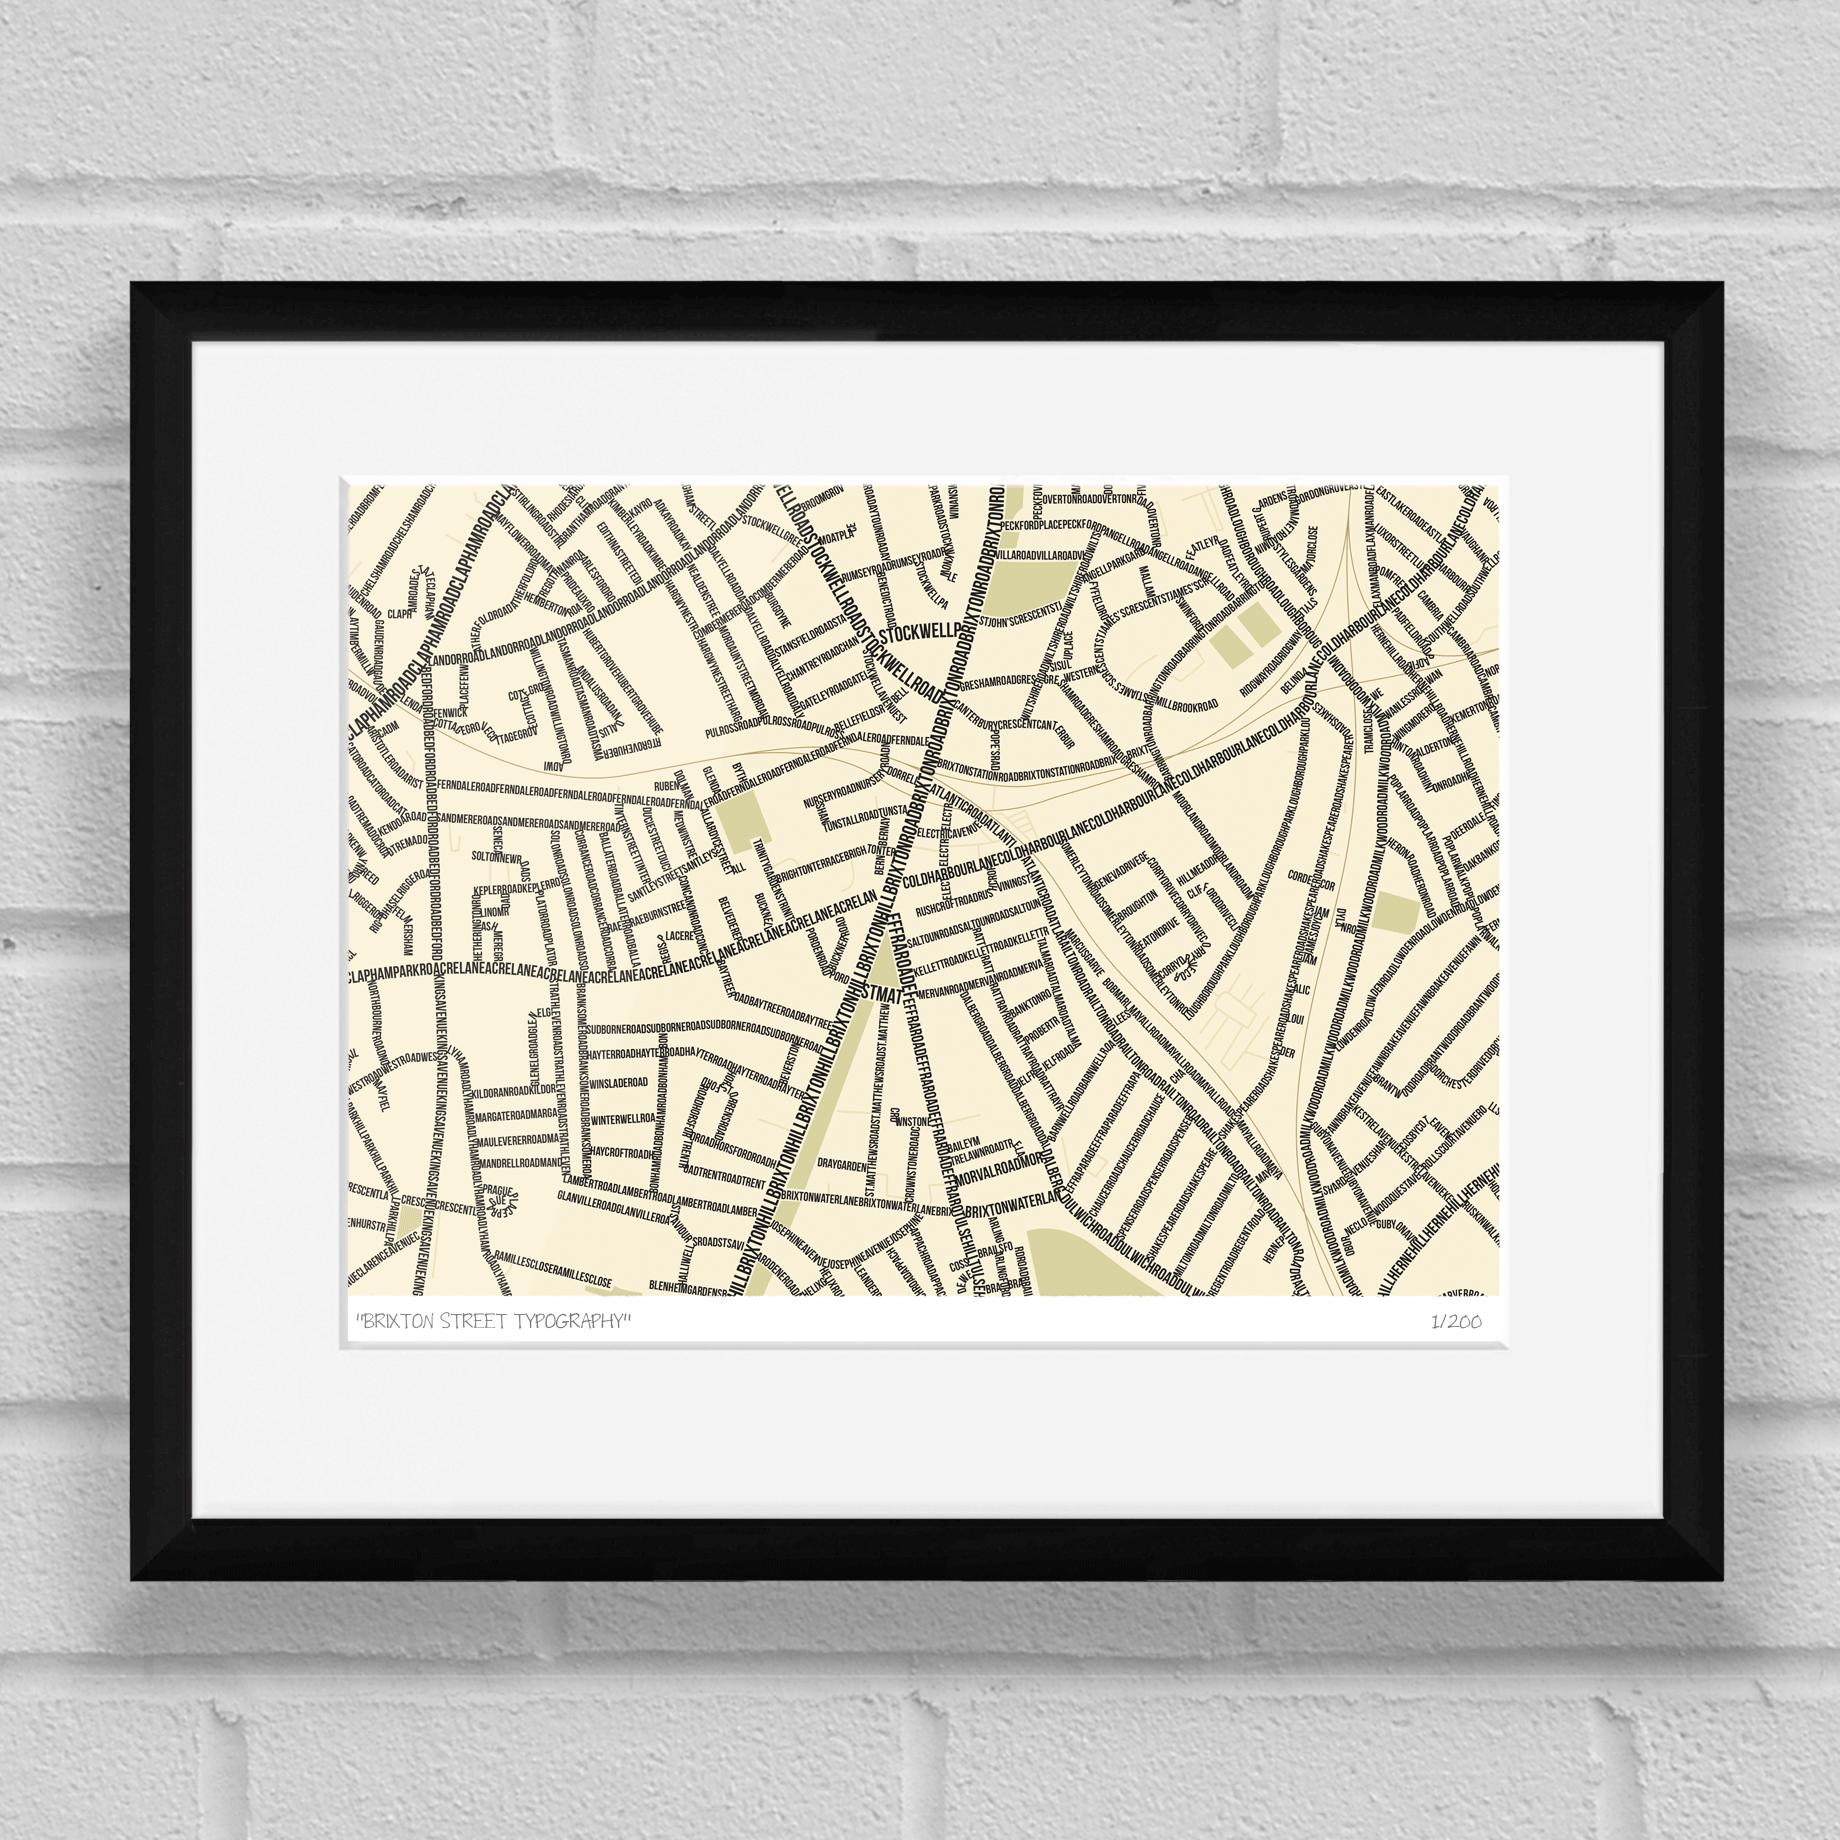 Brixton Street Typography Map Art Poster Print Black Frame